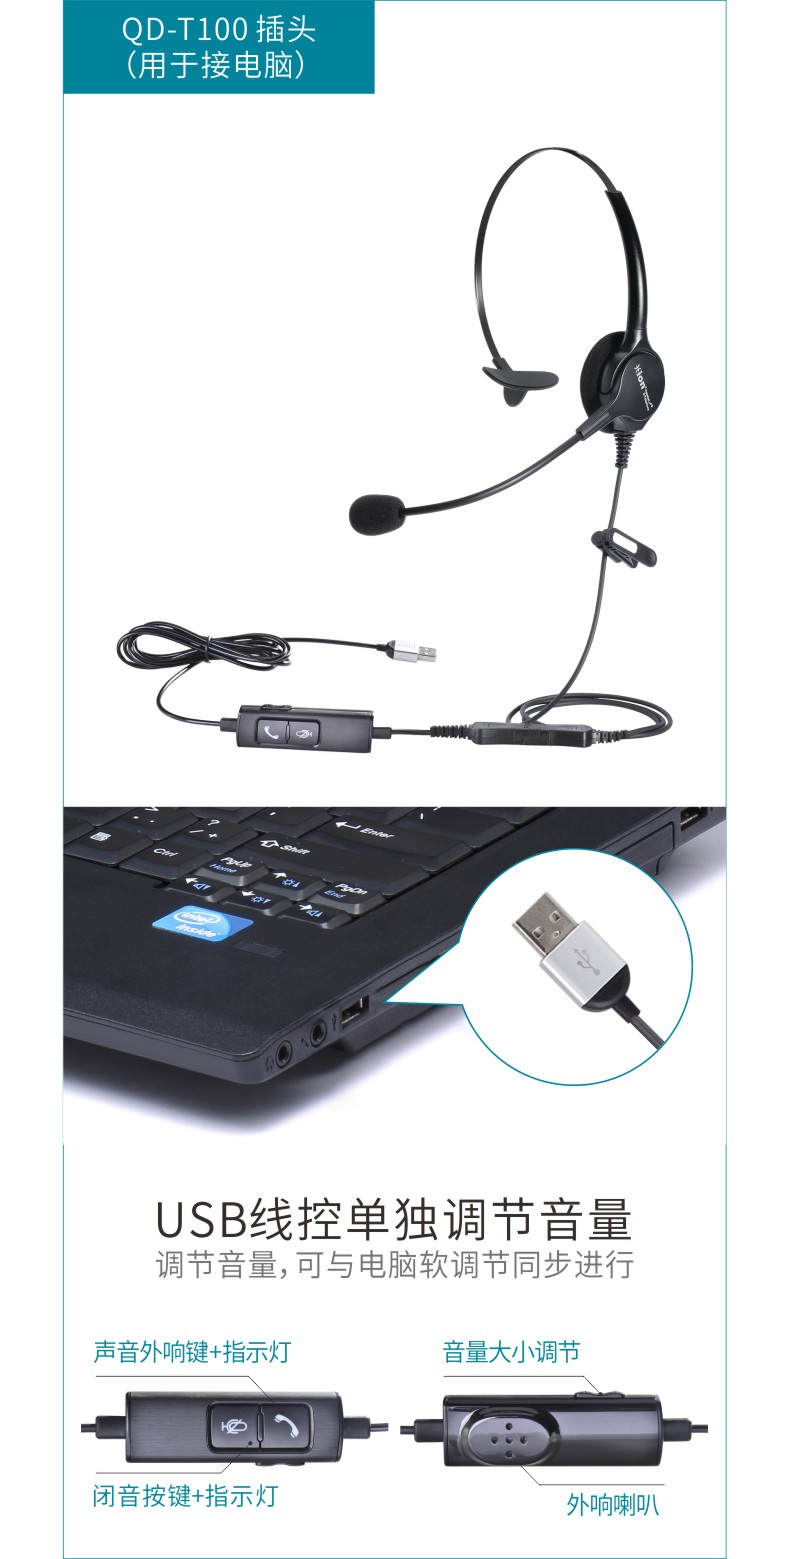 DH90呼叫中心耳机